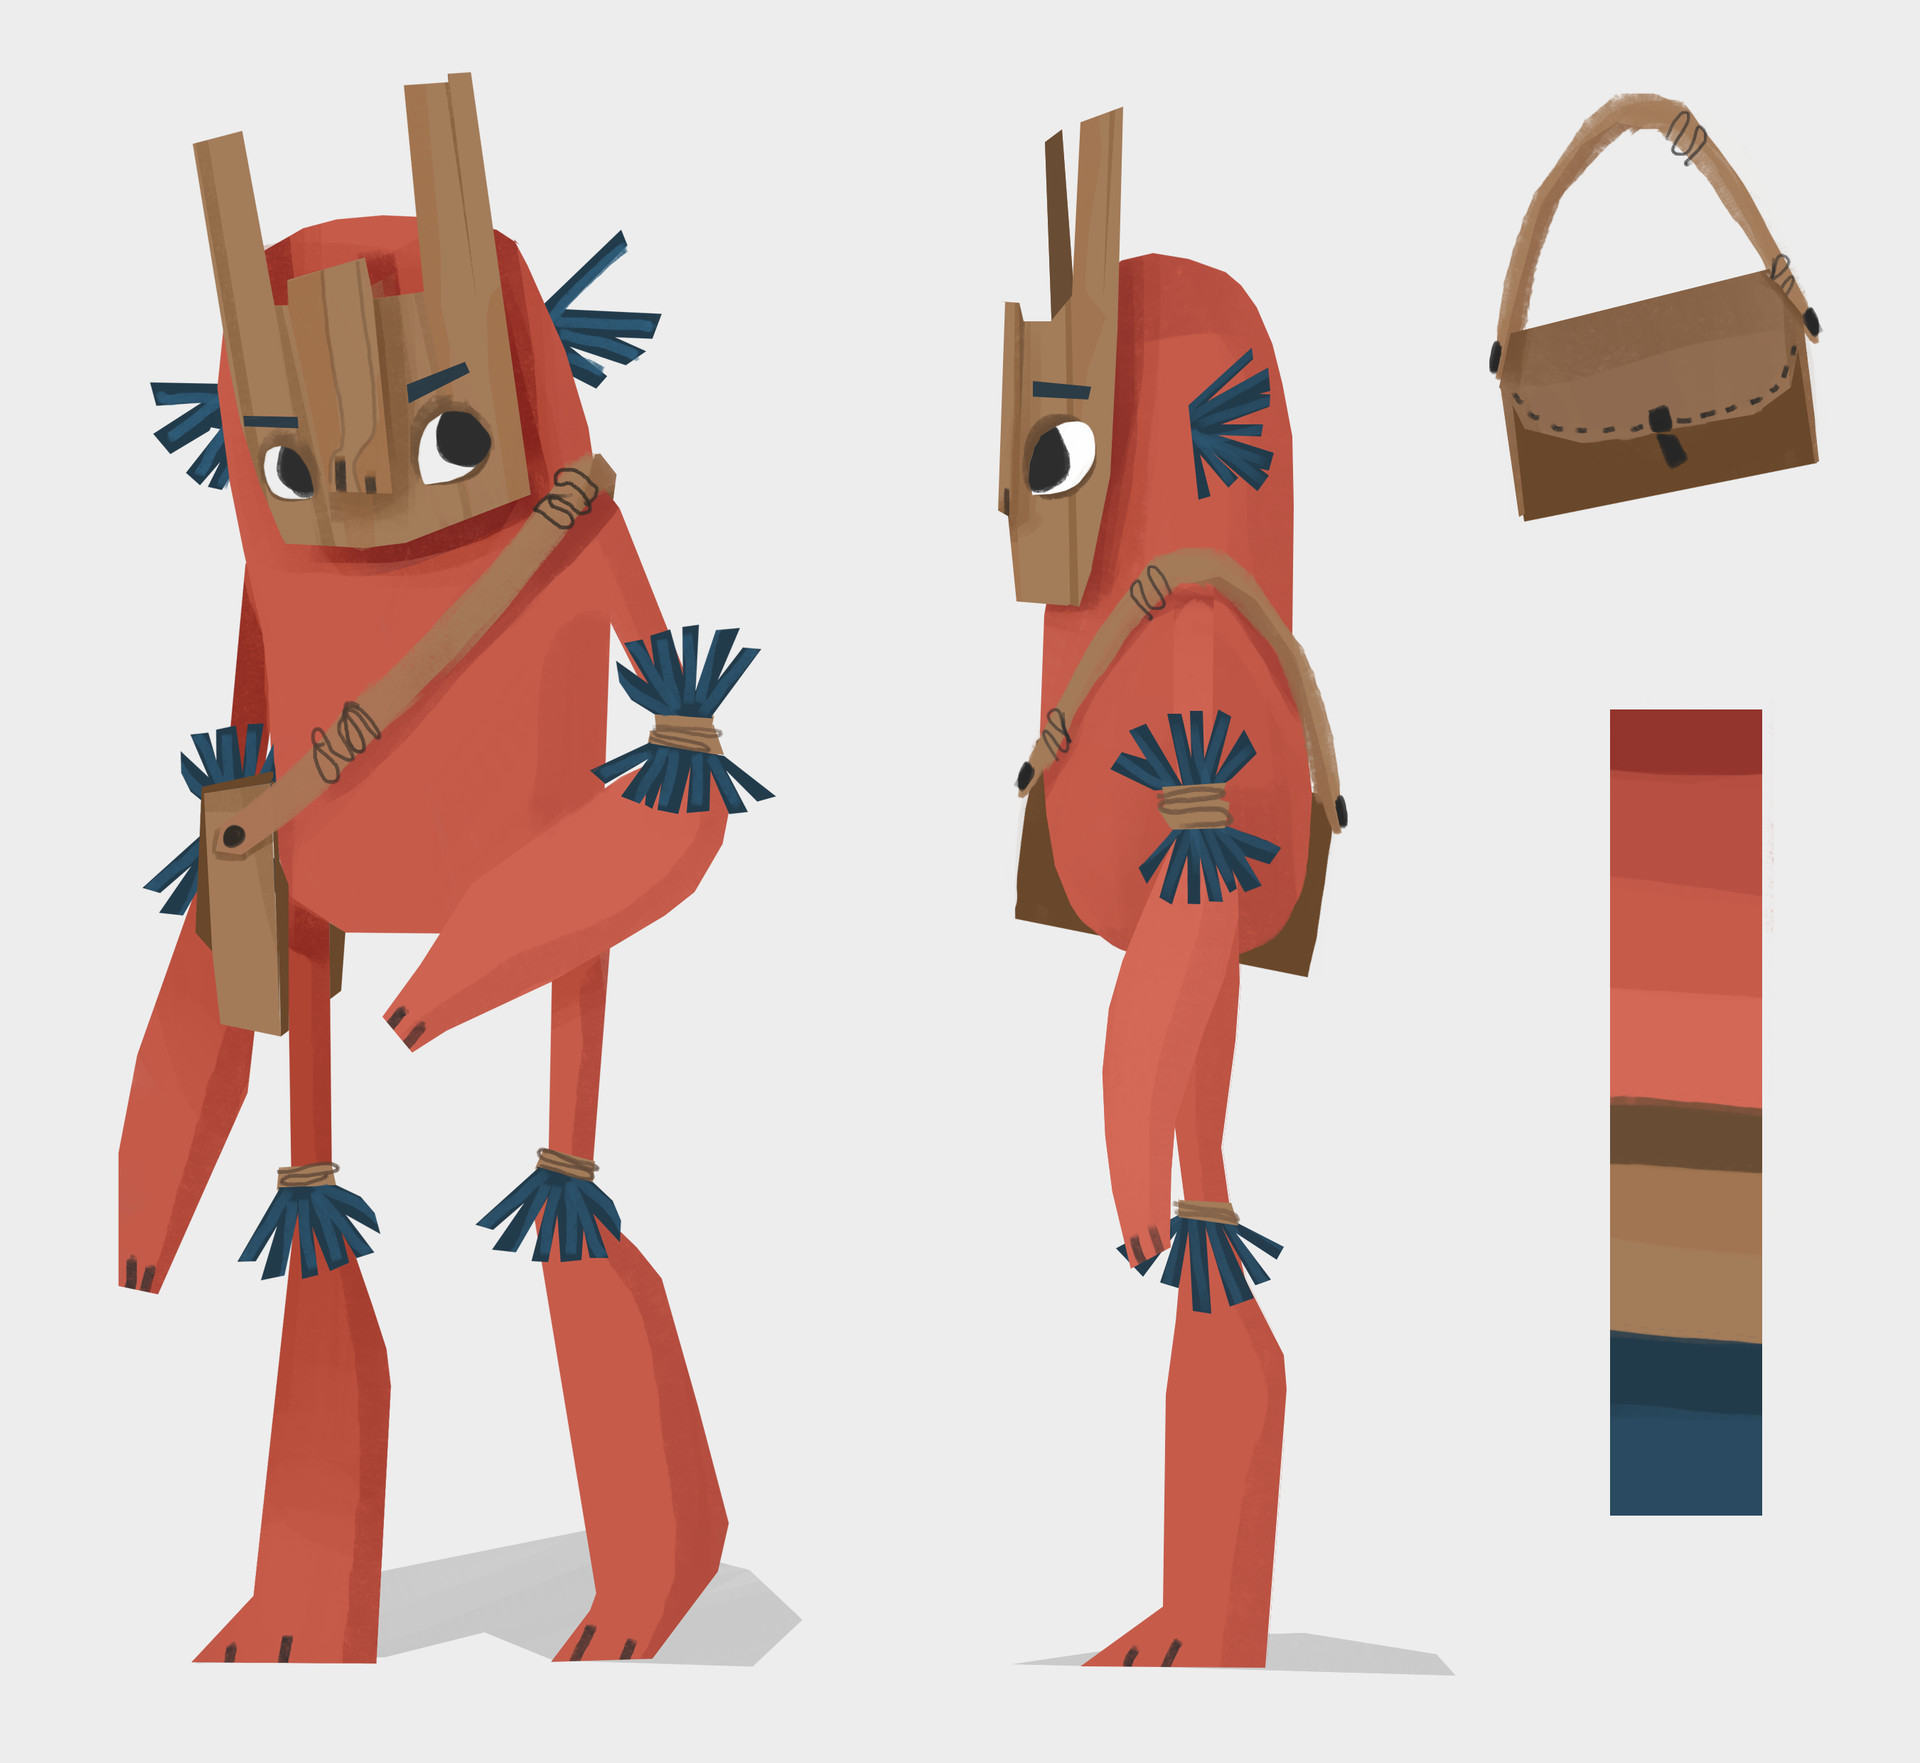 Character Design Courses University : Sylvia wilson university fmp main character